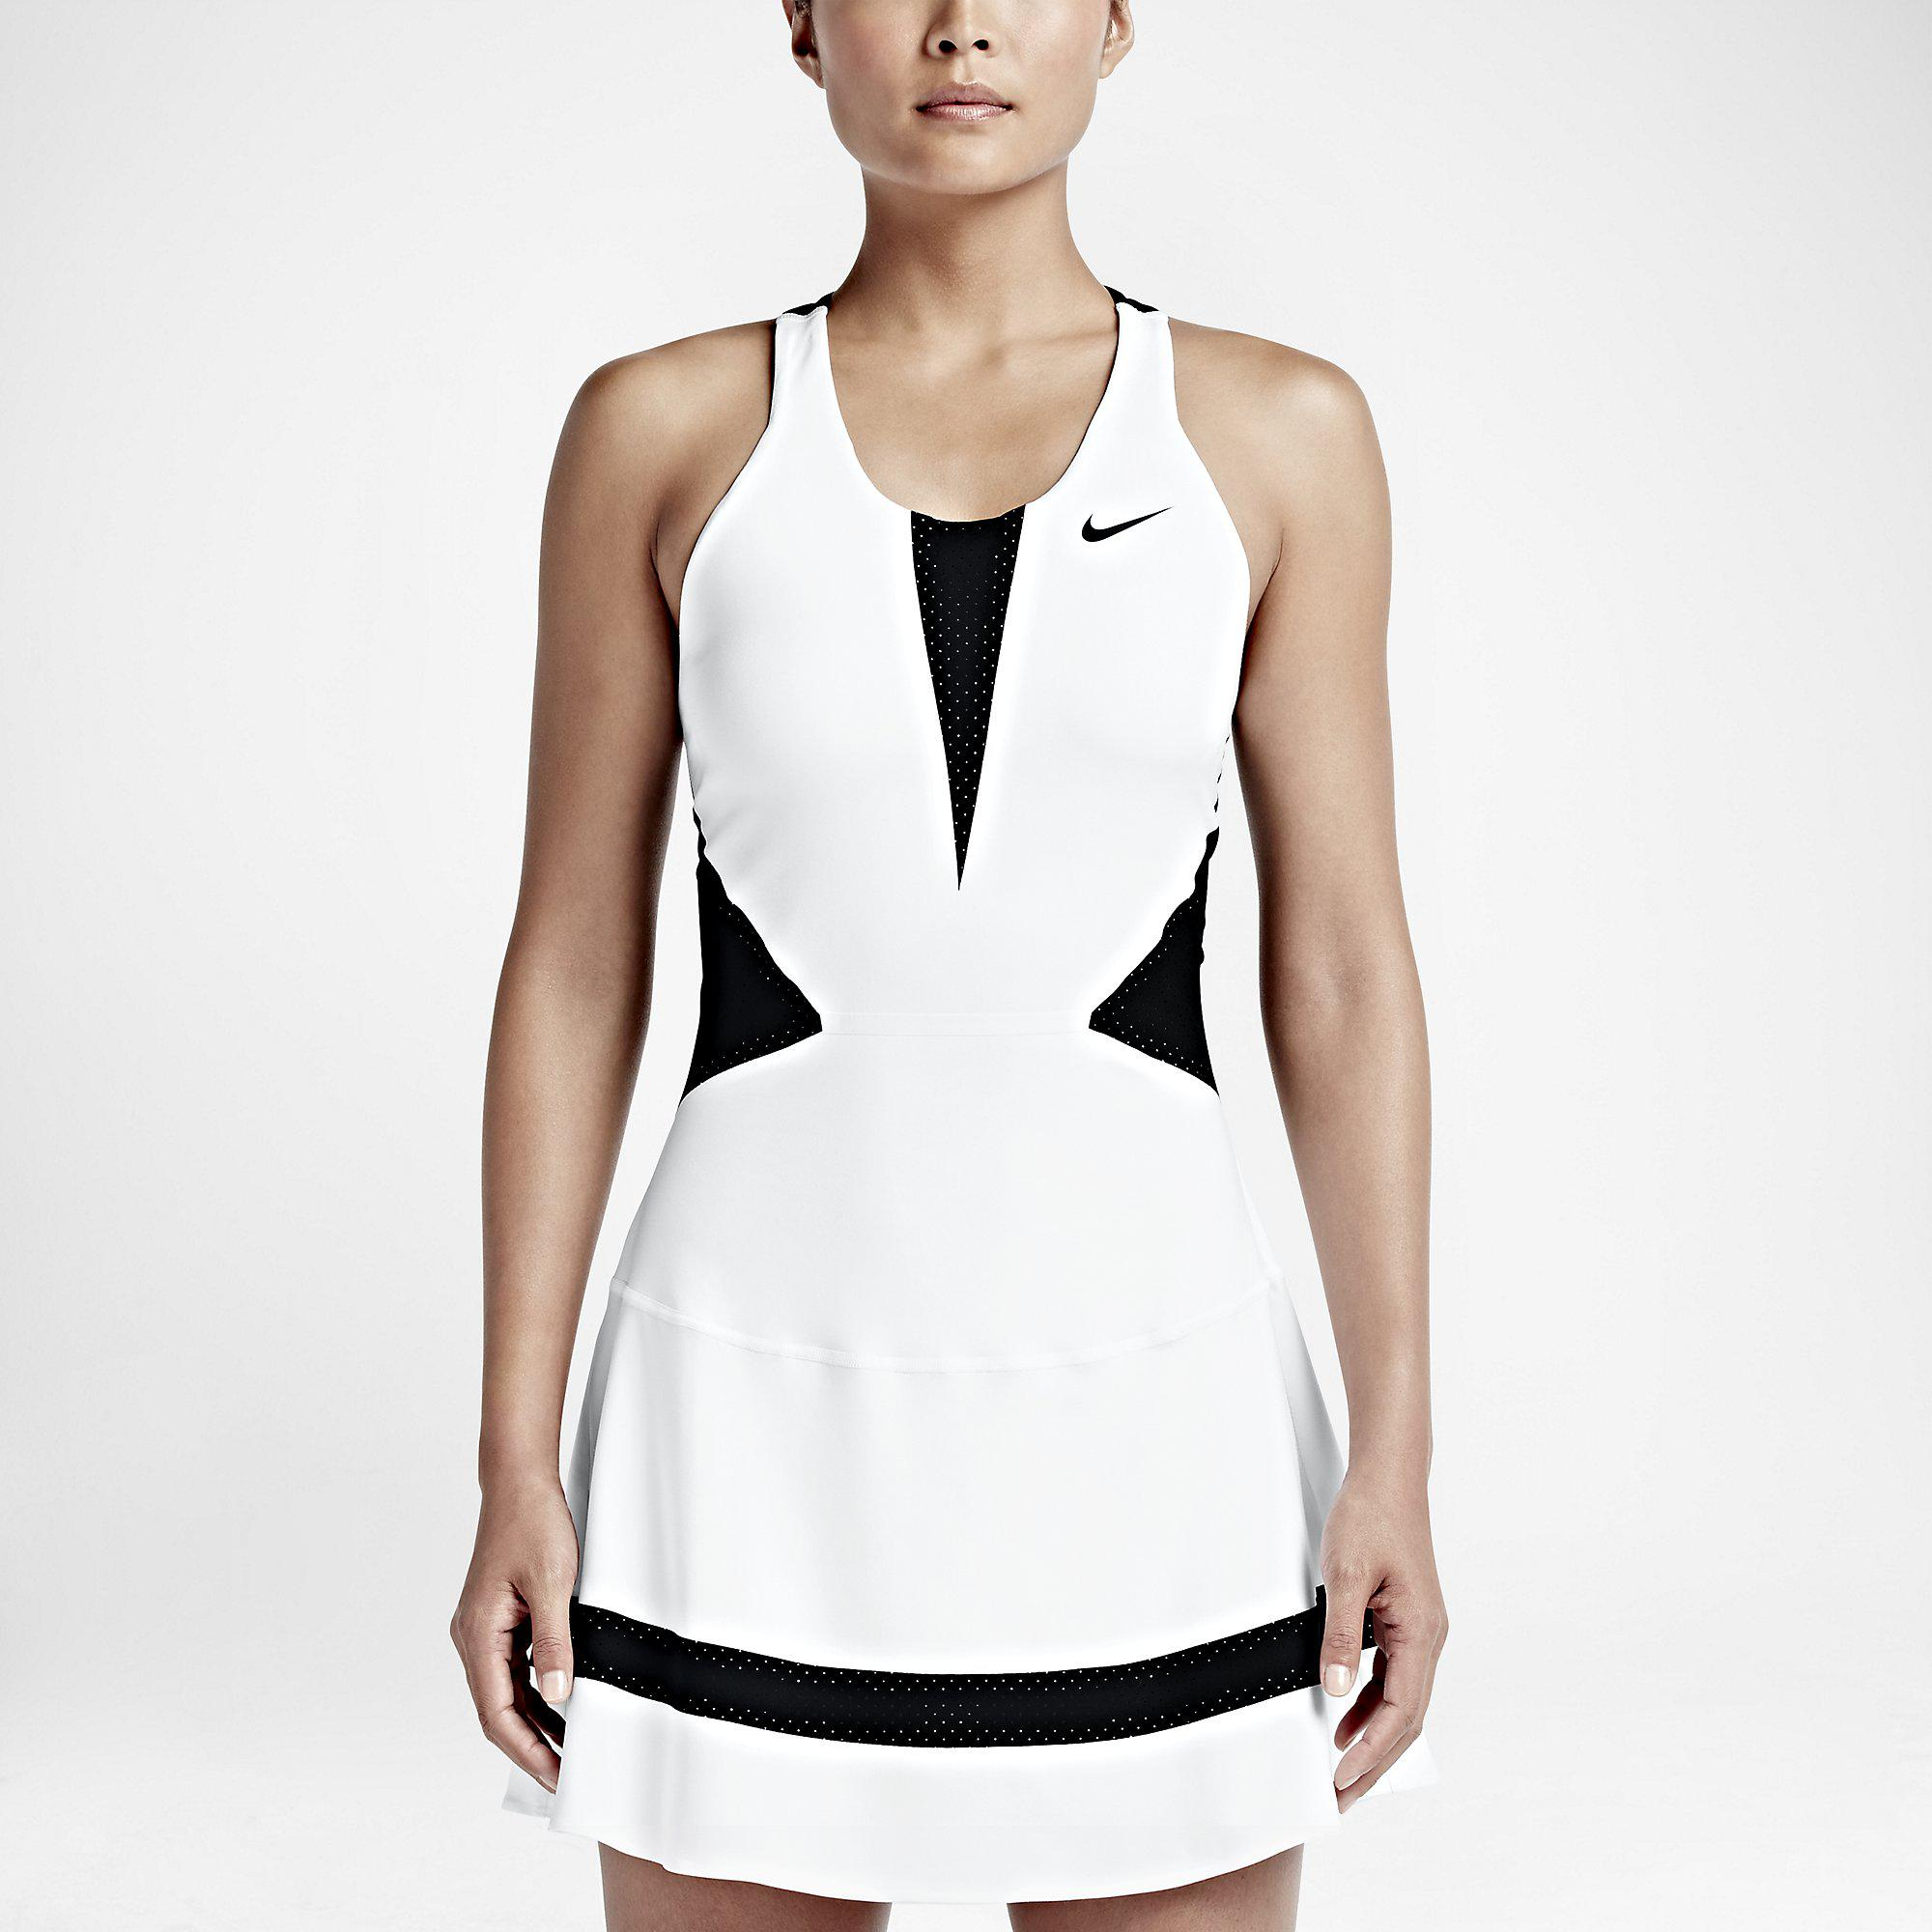 Nike tennis dress white and black